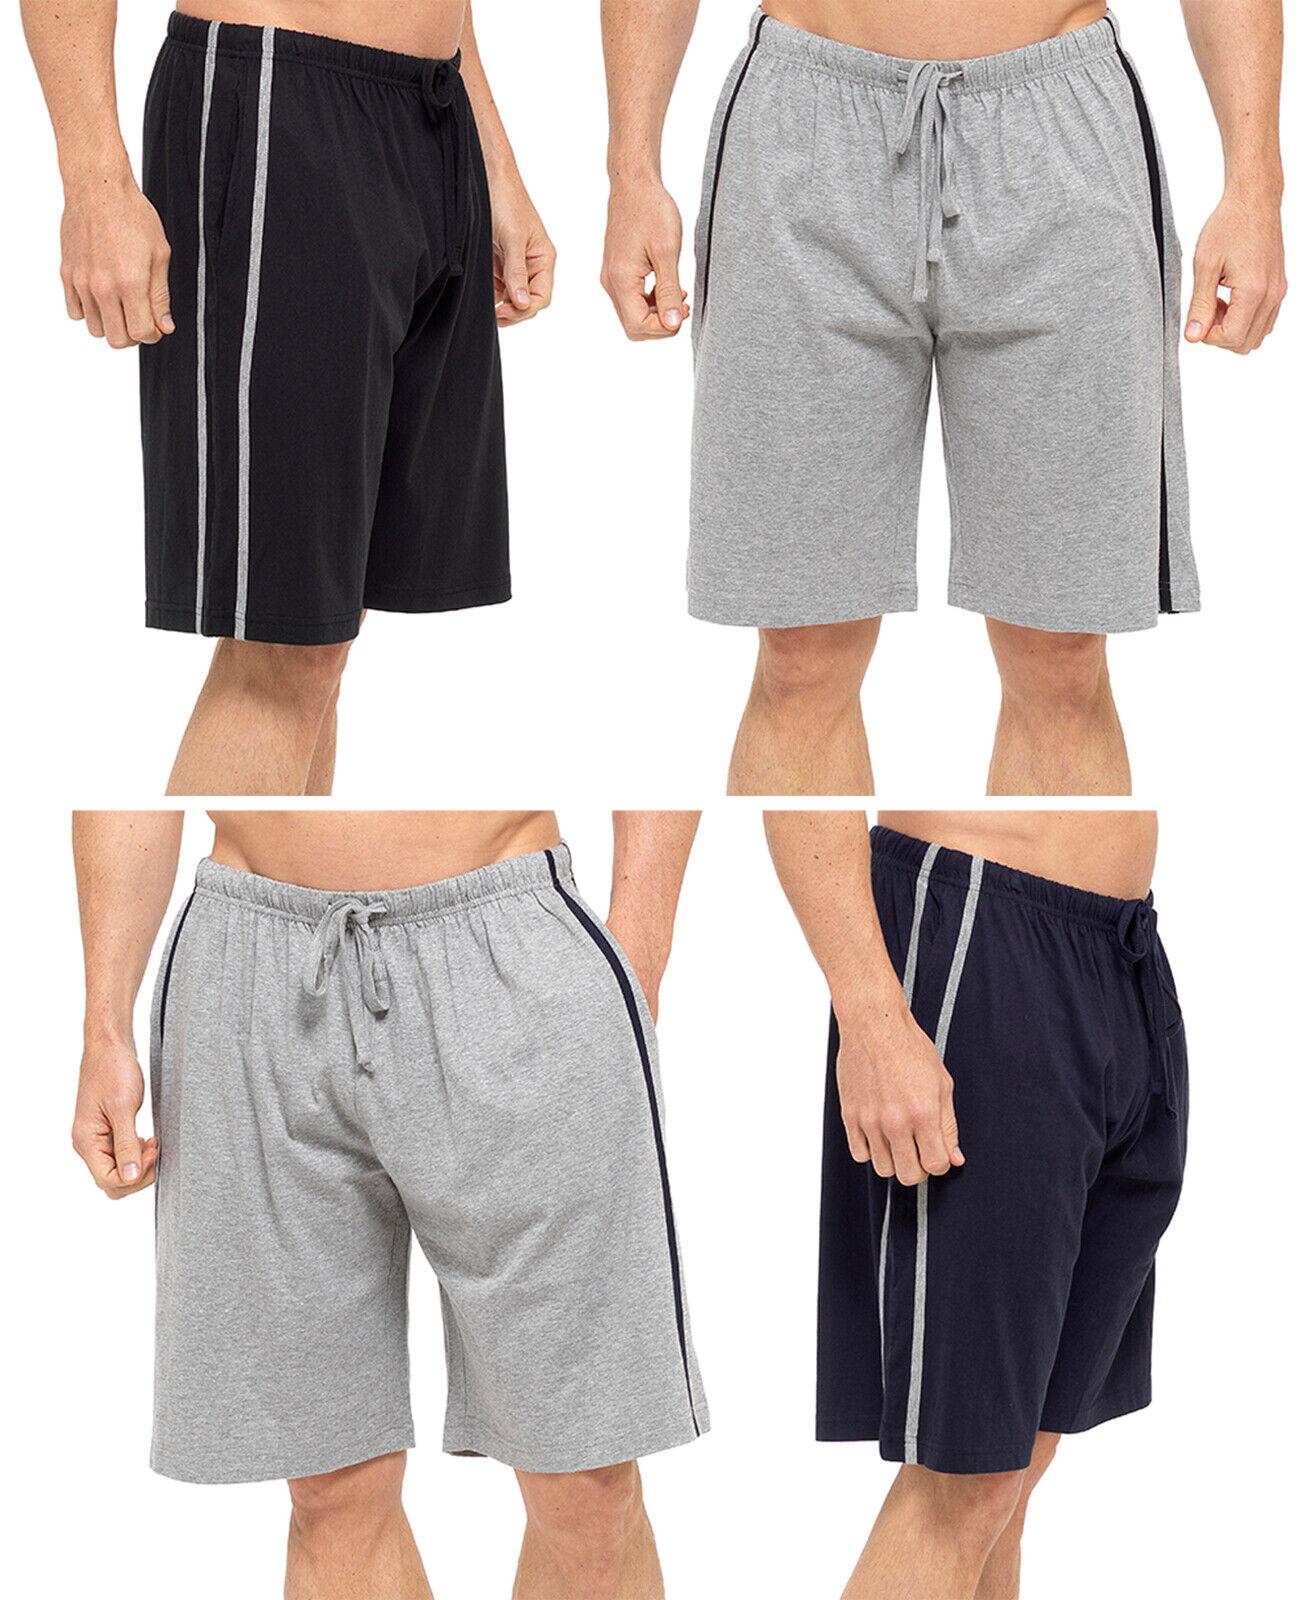 Pantalón Corto para Hombre Deporte Casual Lounge Desgaste a Rayas Chándal Bottoms Paquete de 2 tamaño de los chicos